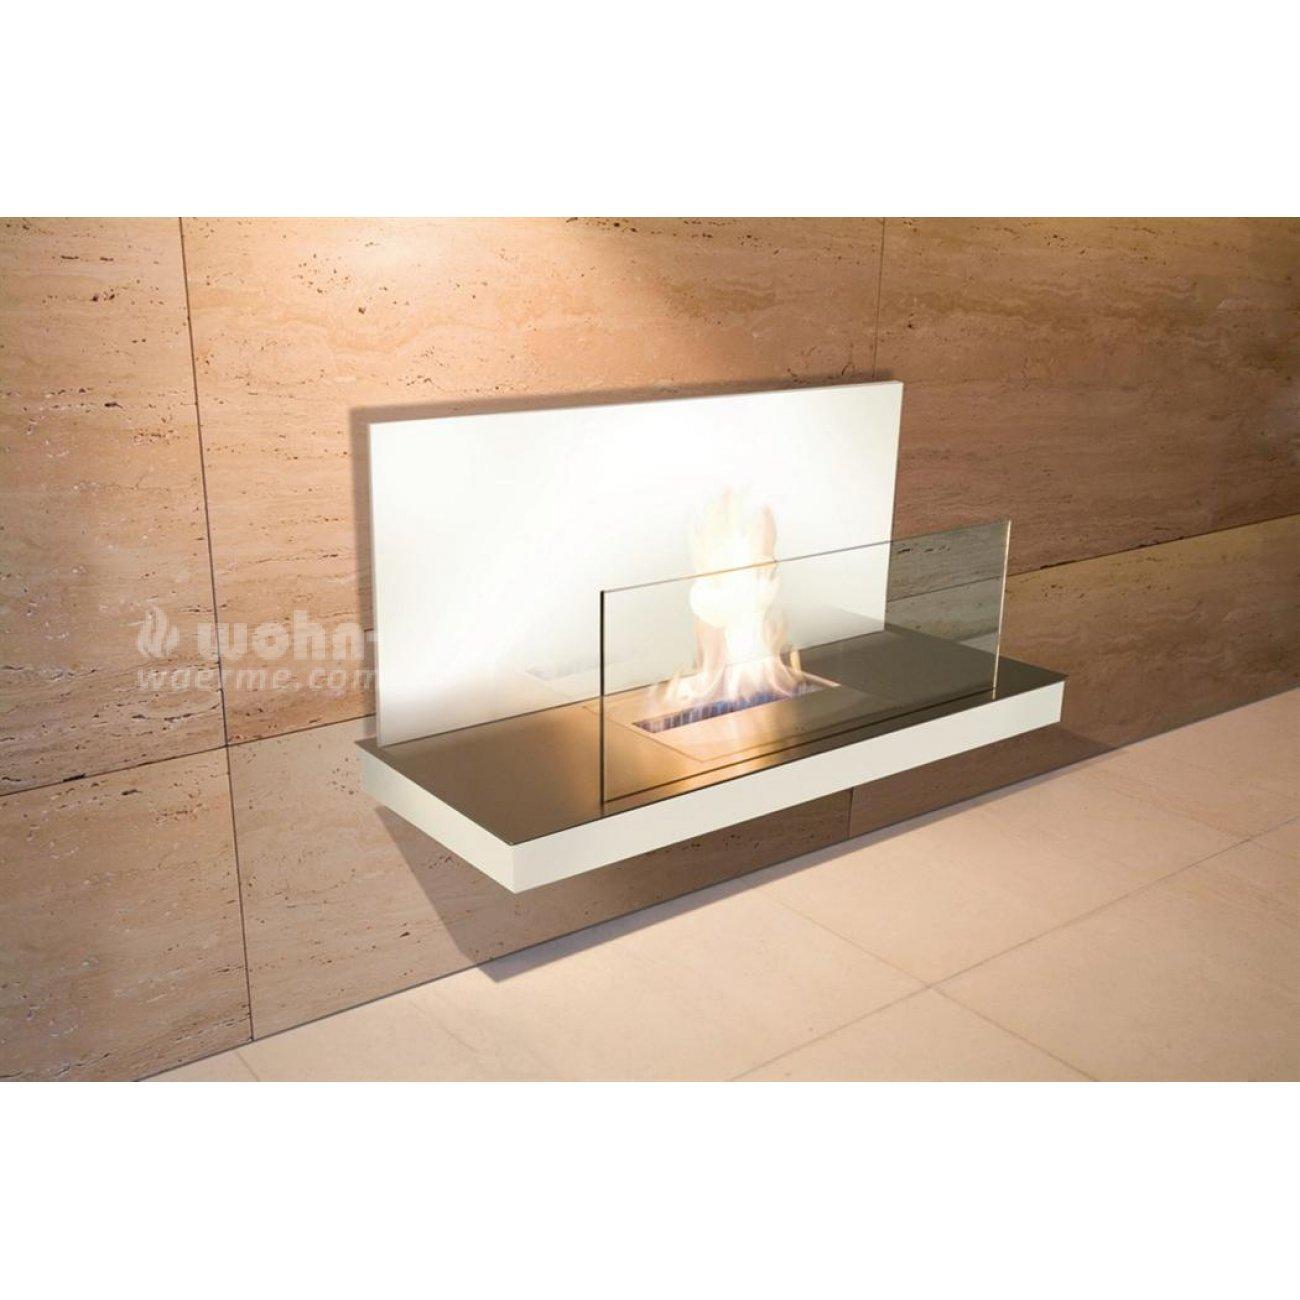 radius ethanol wandkamin wall flame ii. Black Bedroom Furniture Sets. Home Design Ideas